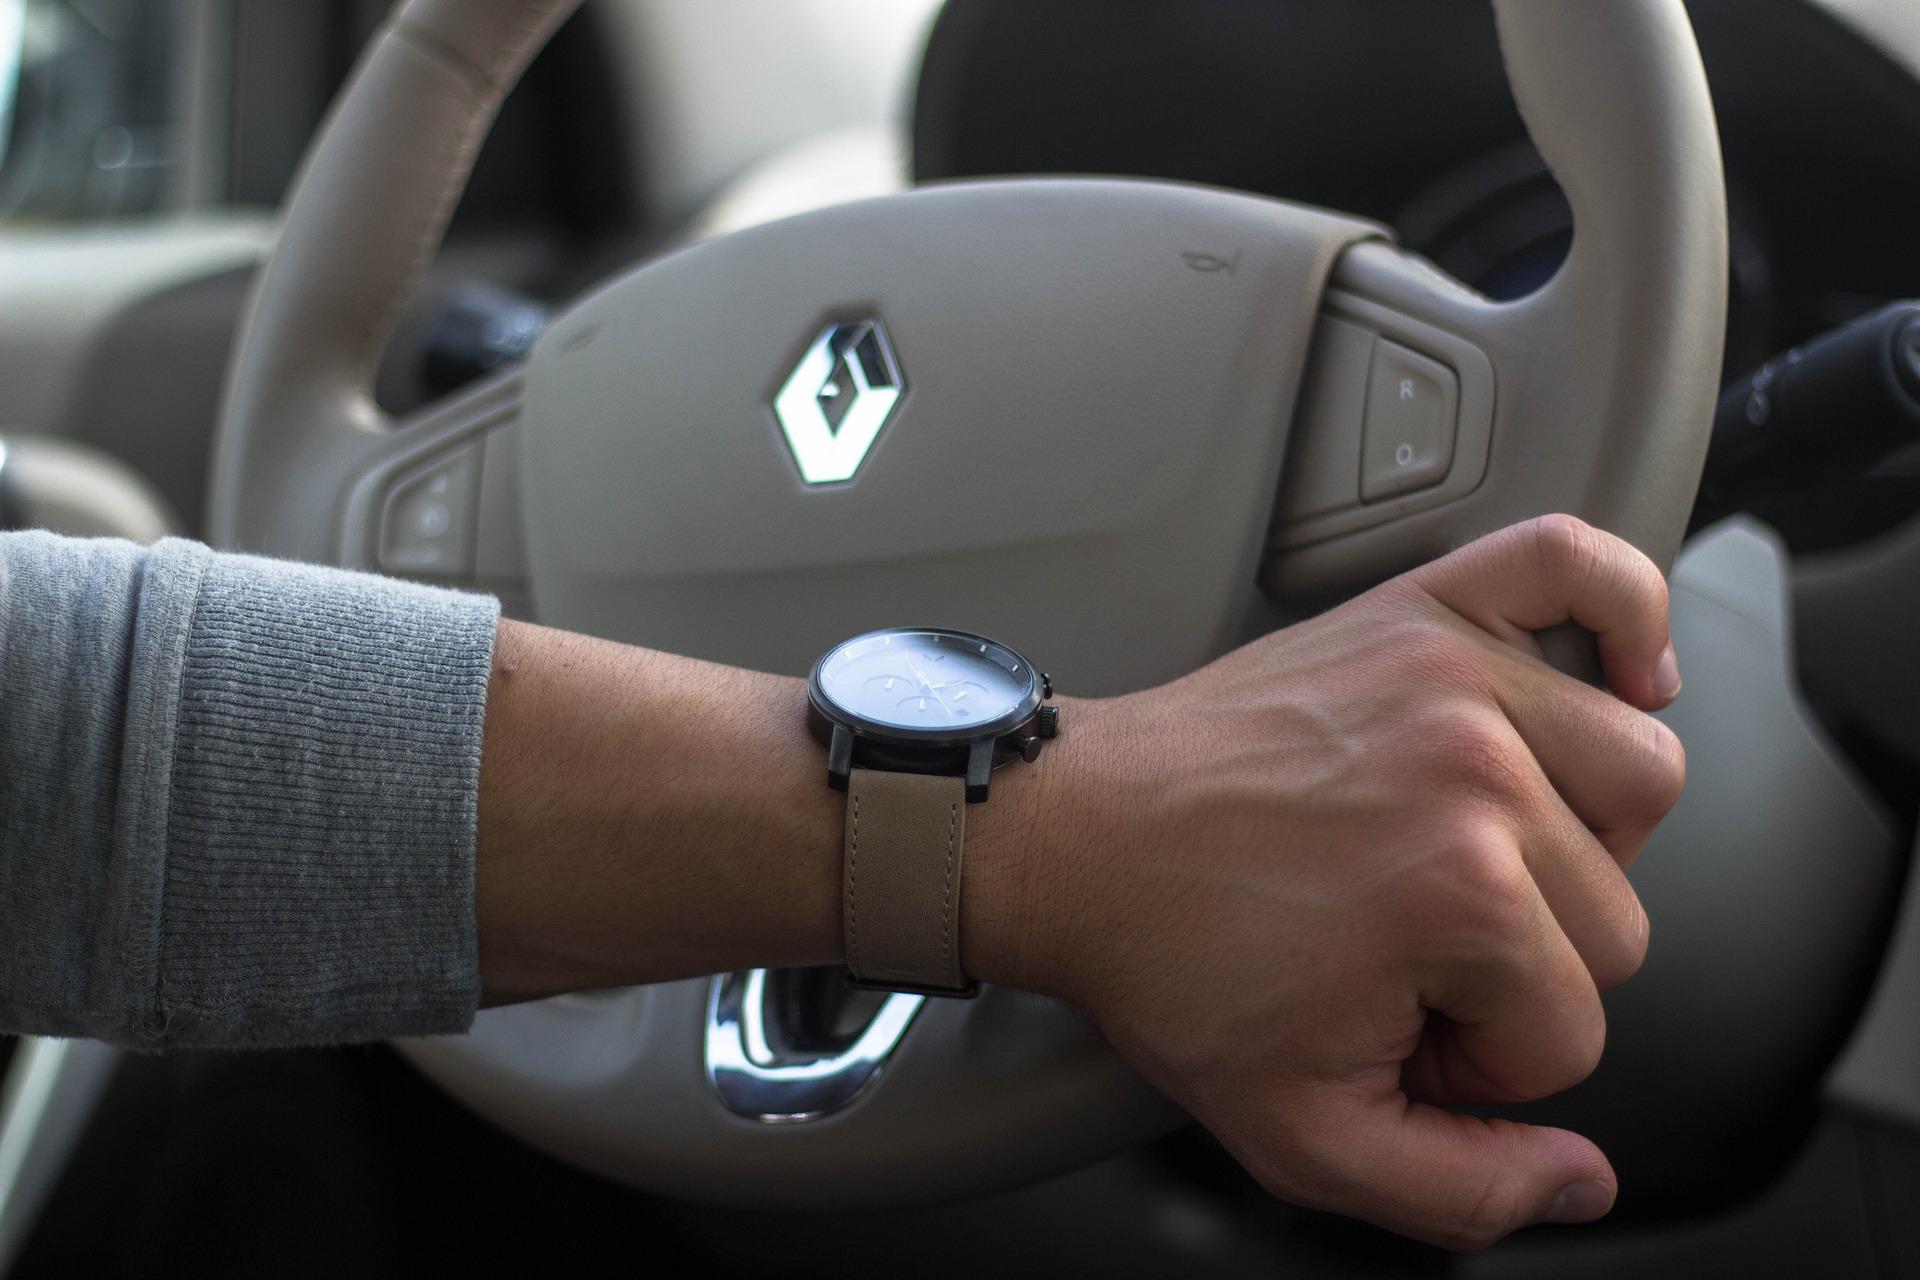 Renault Prepares For EV Production With Their Mégane E-TECH